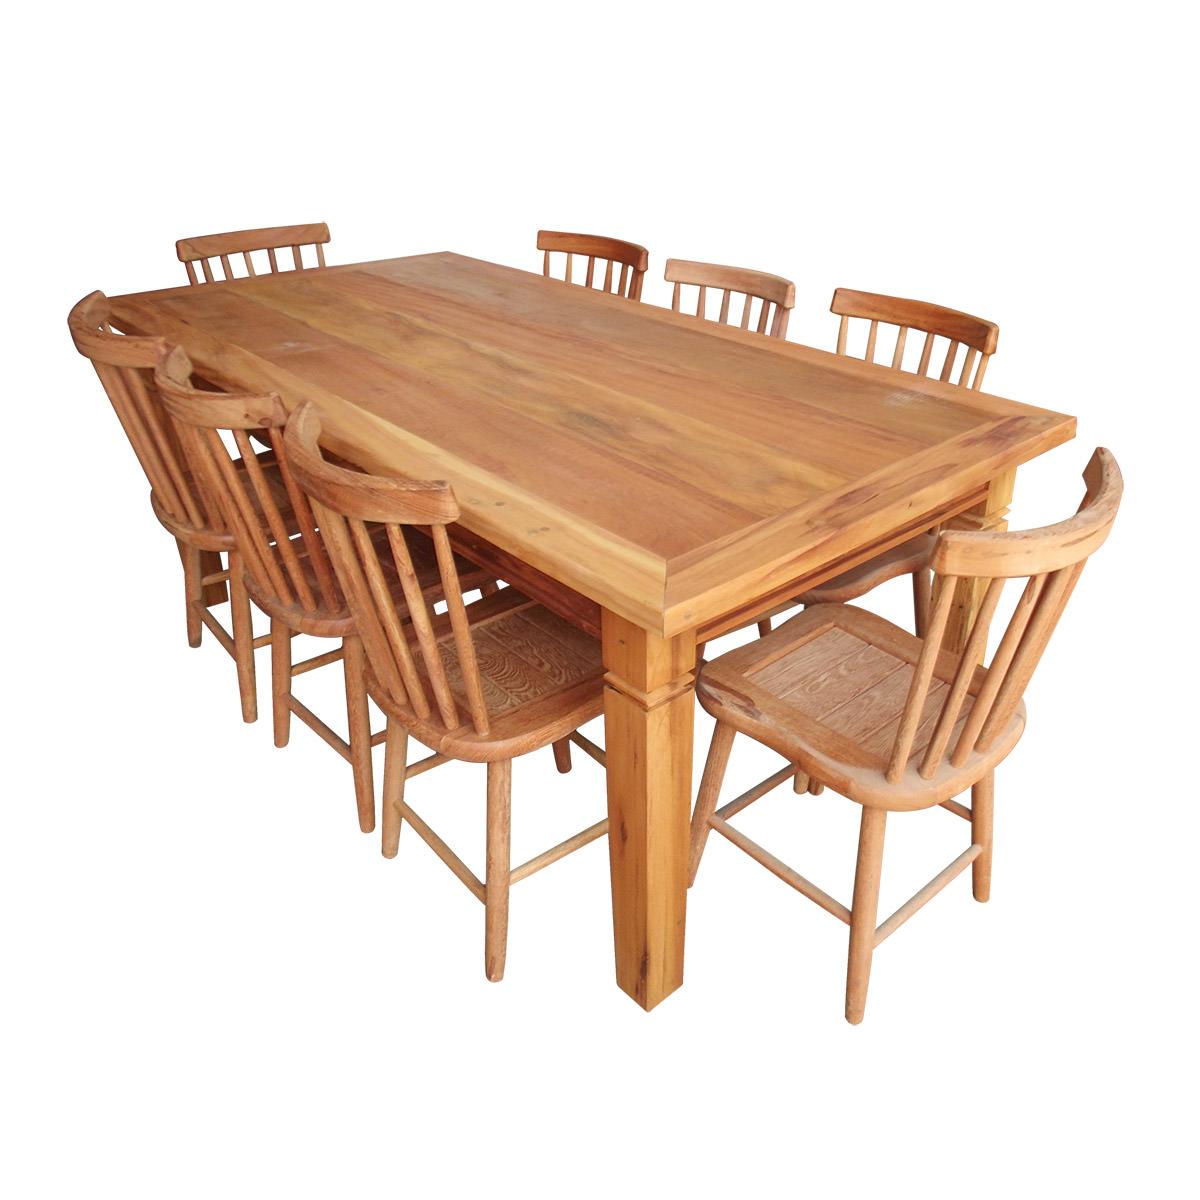 Início / Conjunto De Mesa / Conjunto De Mesa Com 8 Cadeiras #AA6621 1200x1200